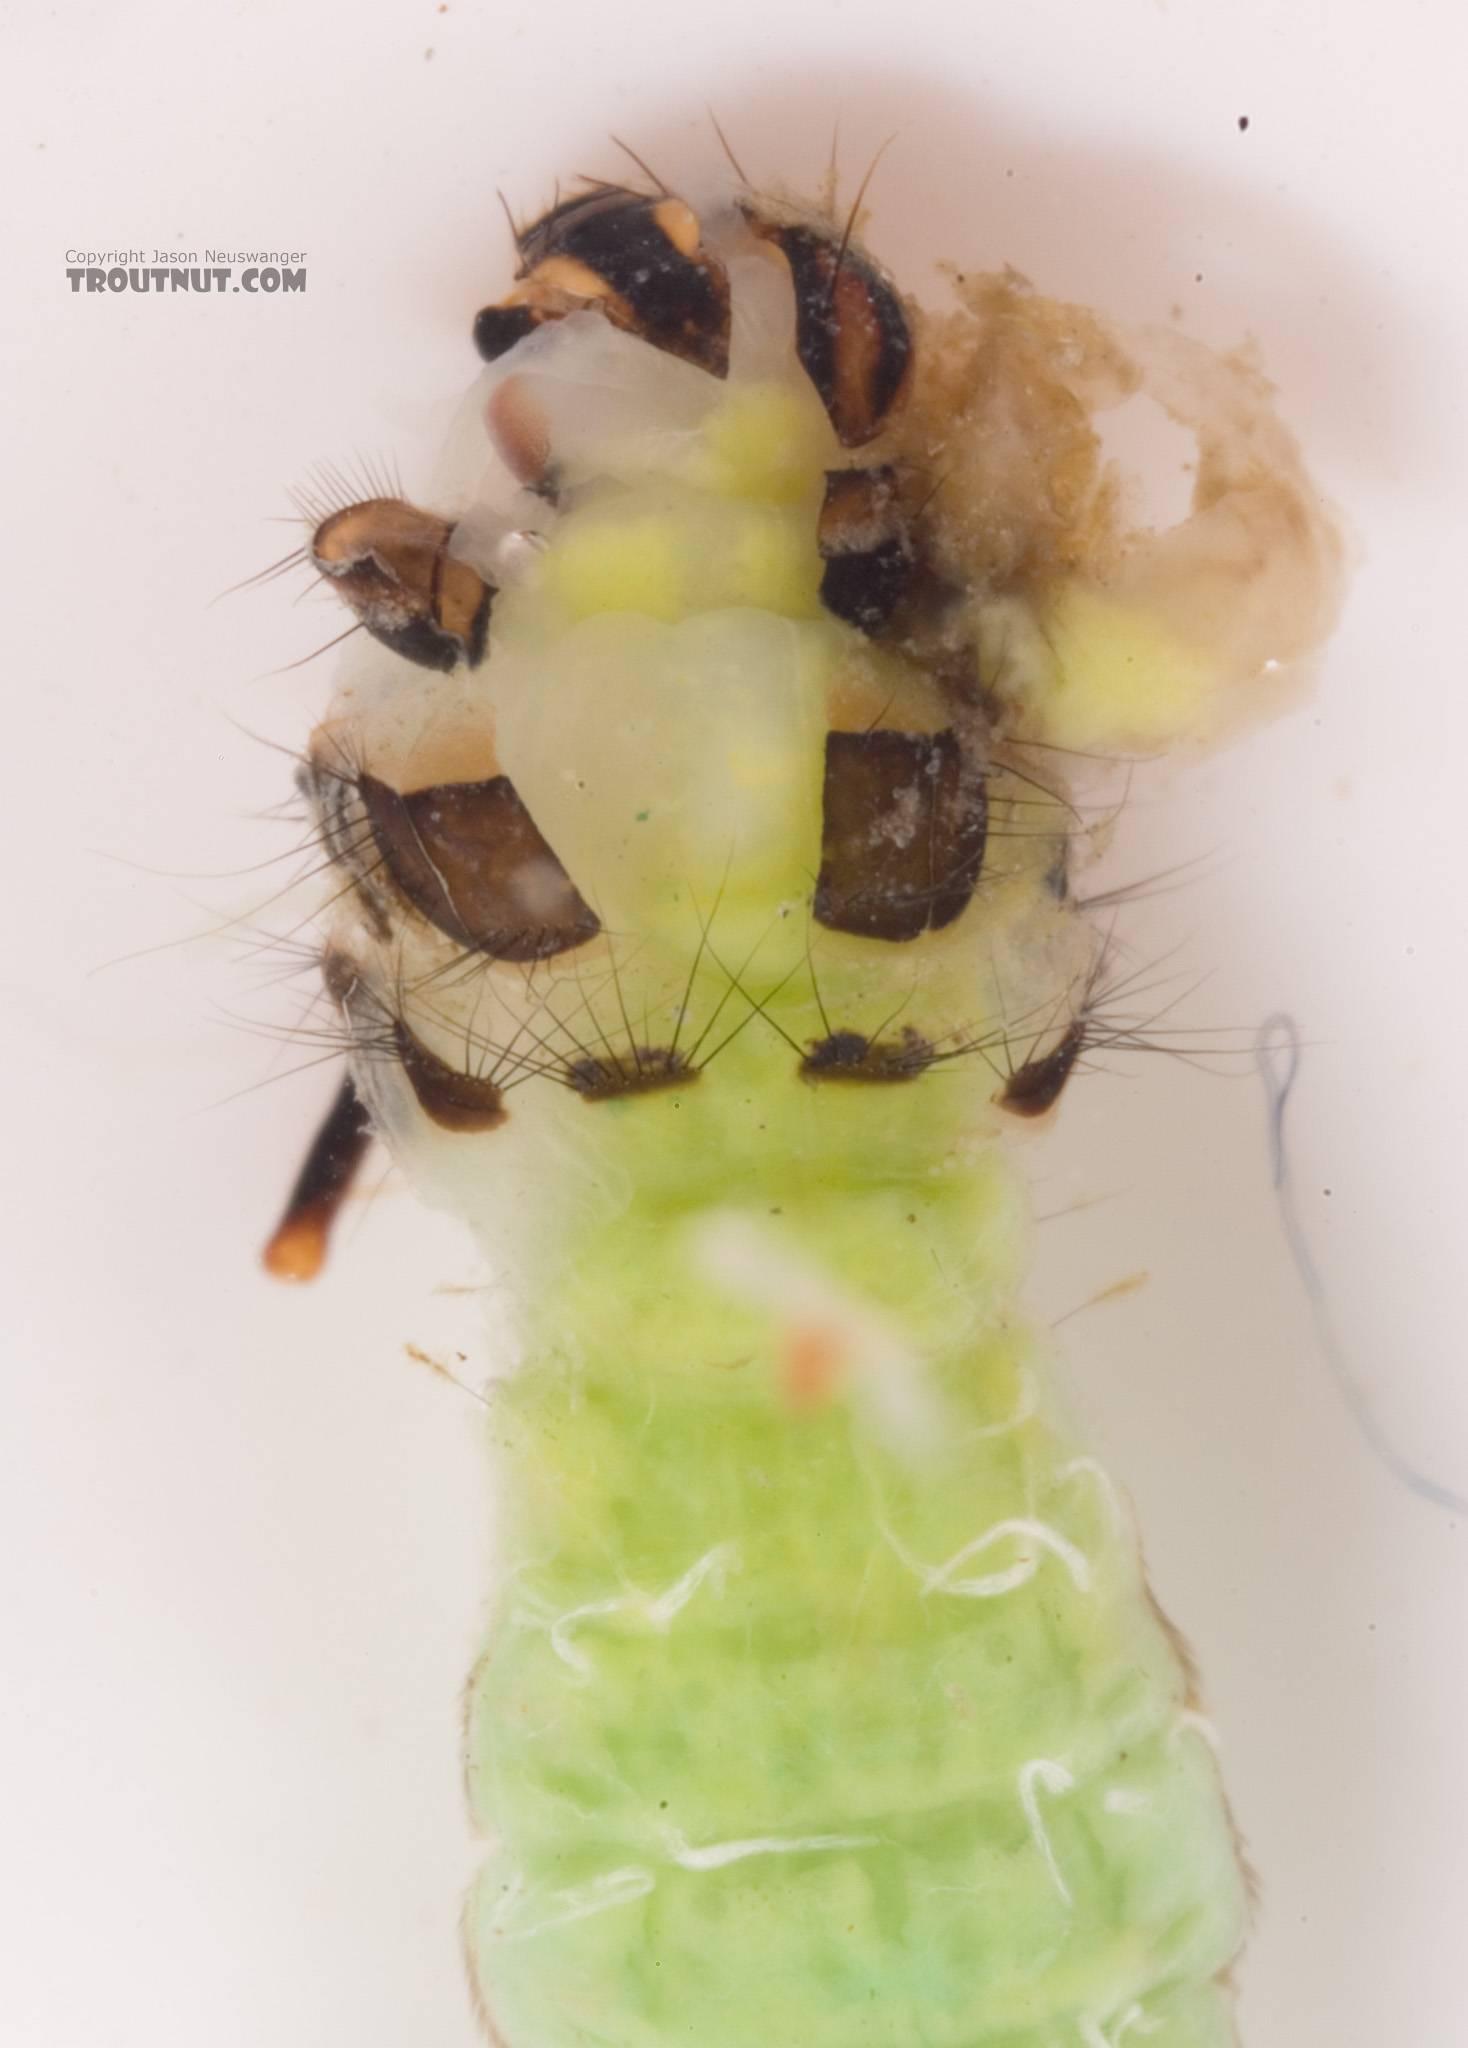 Incredible hulk?  Brachycentrus (Grannoms) Caddisfly Pupa from Cayuta Creek in New York